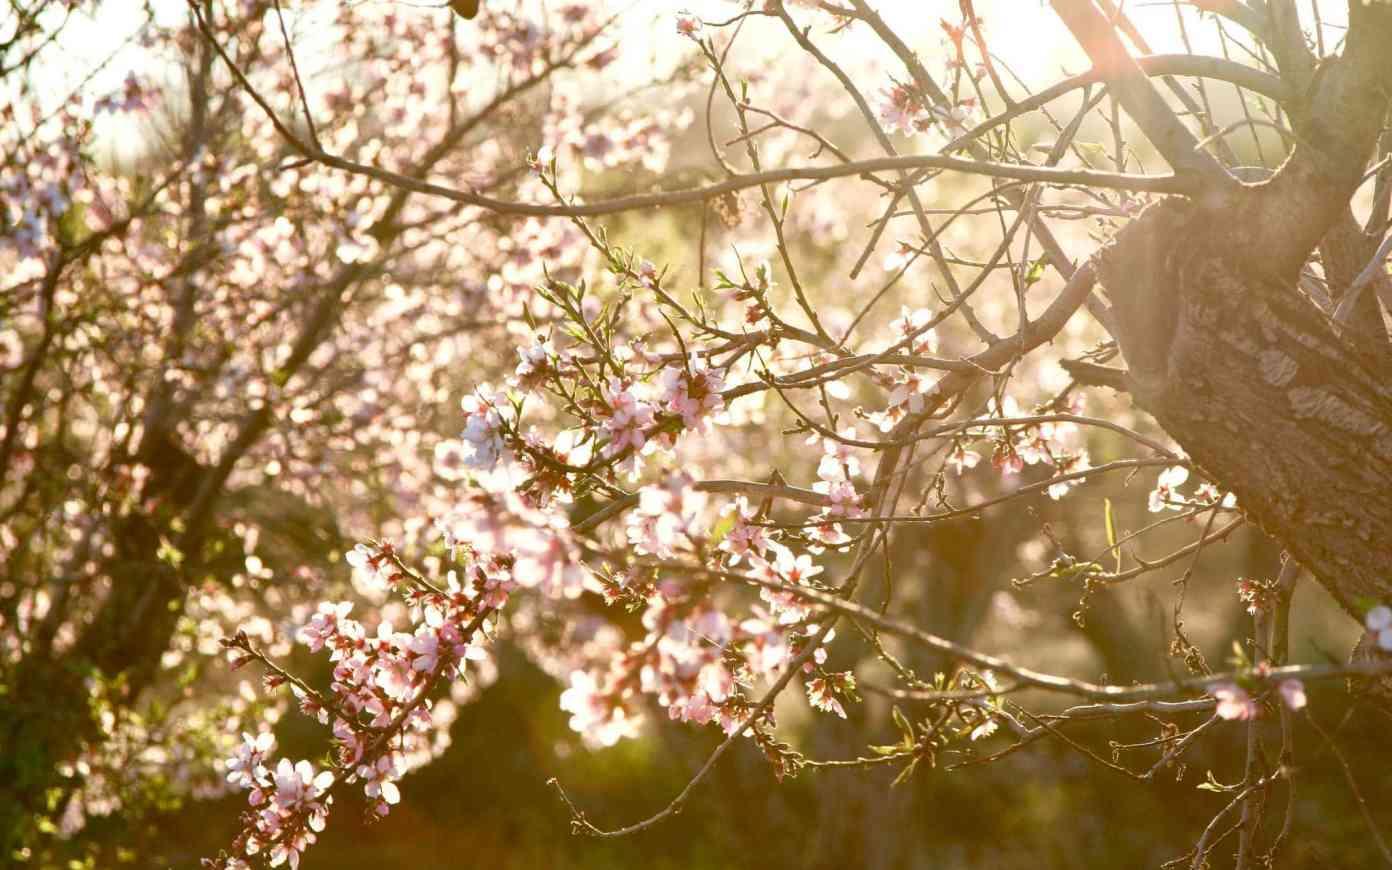 Dívej, kvetou mandloně